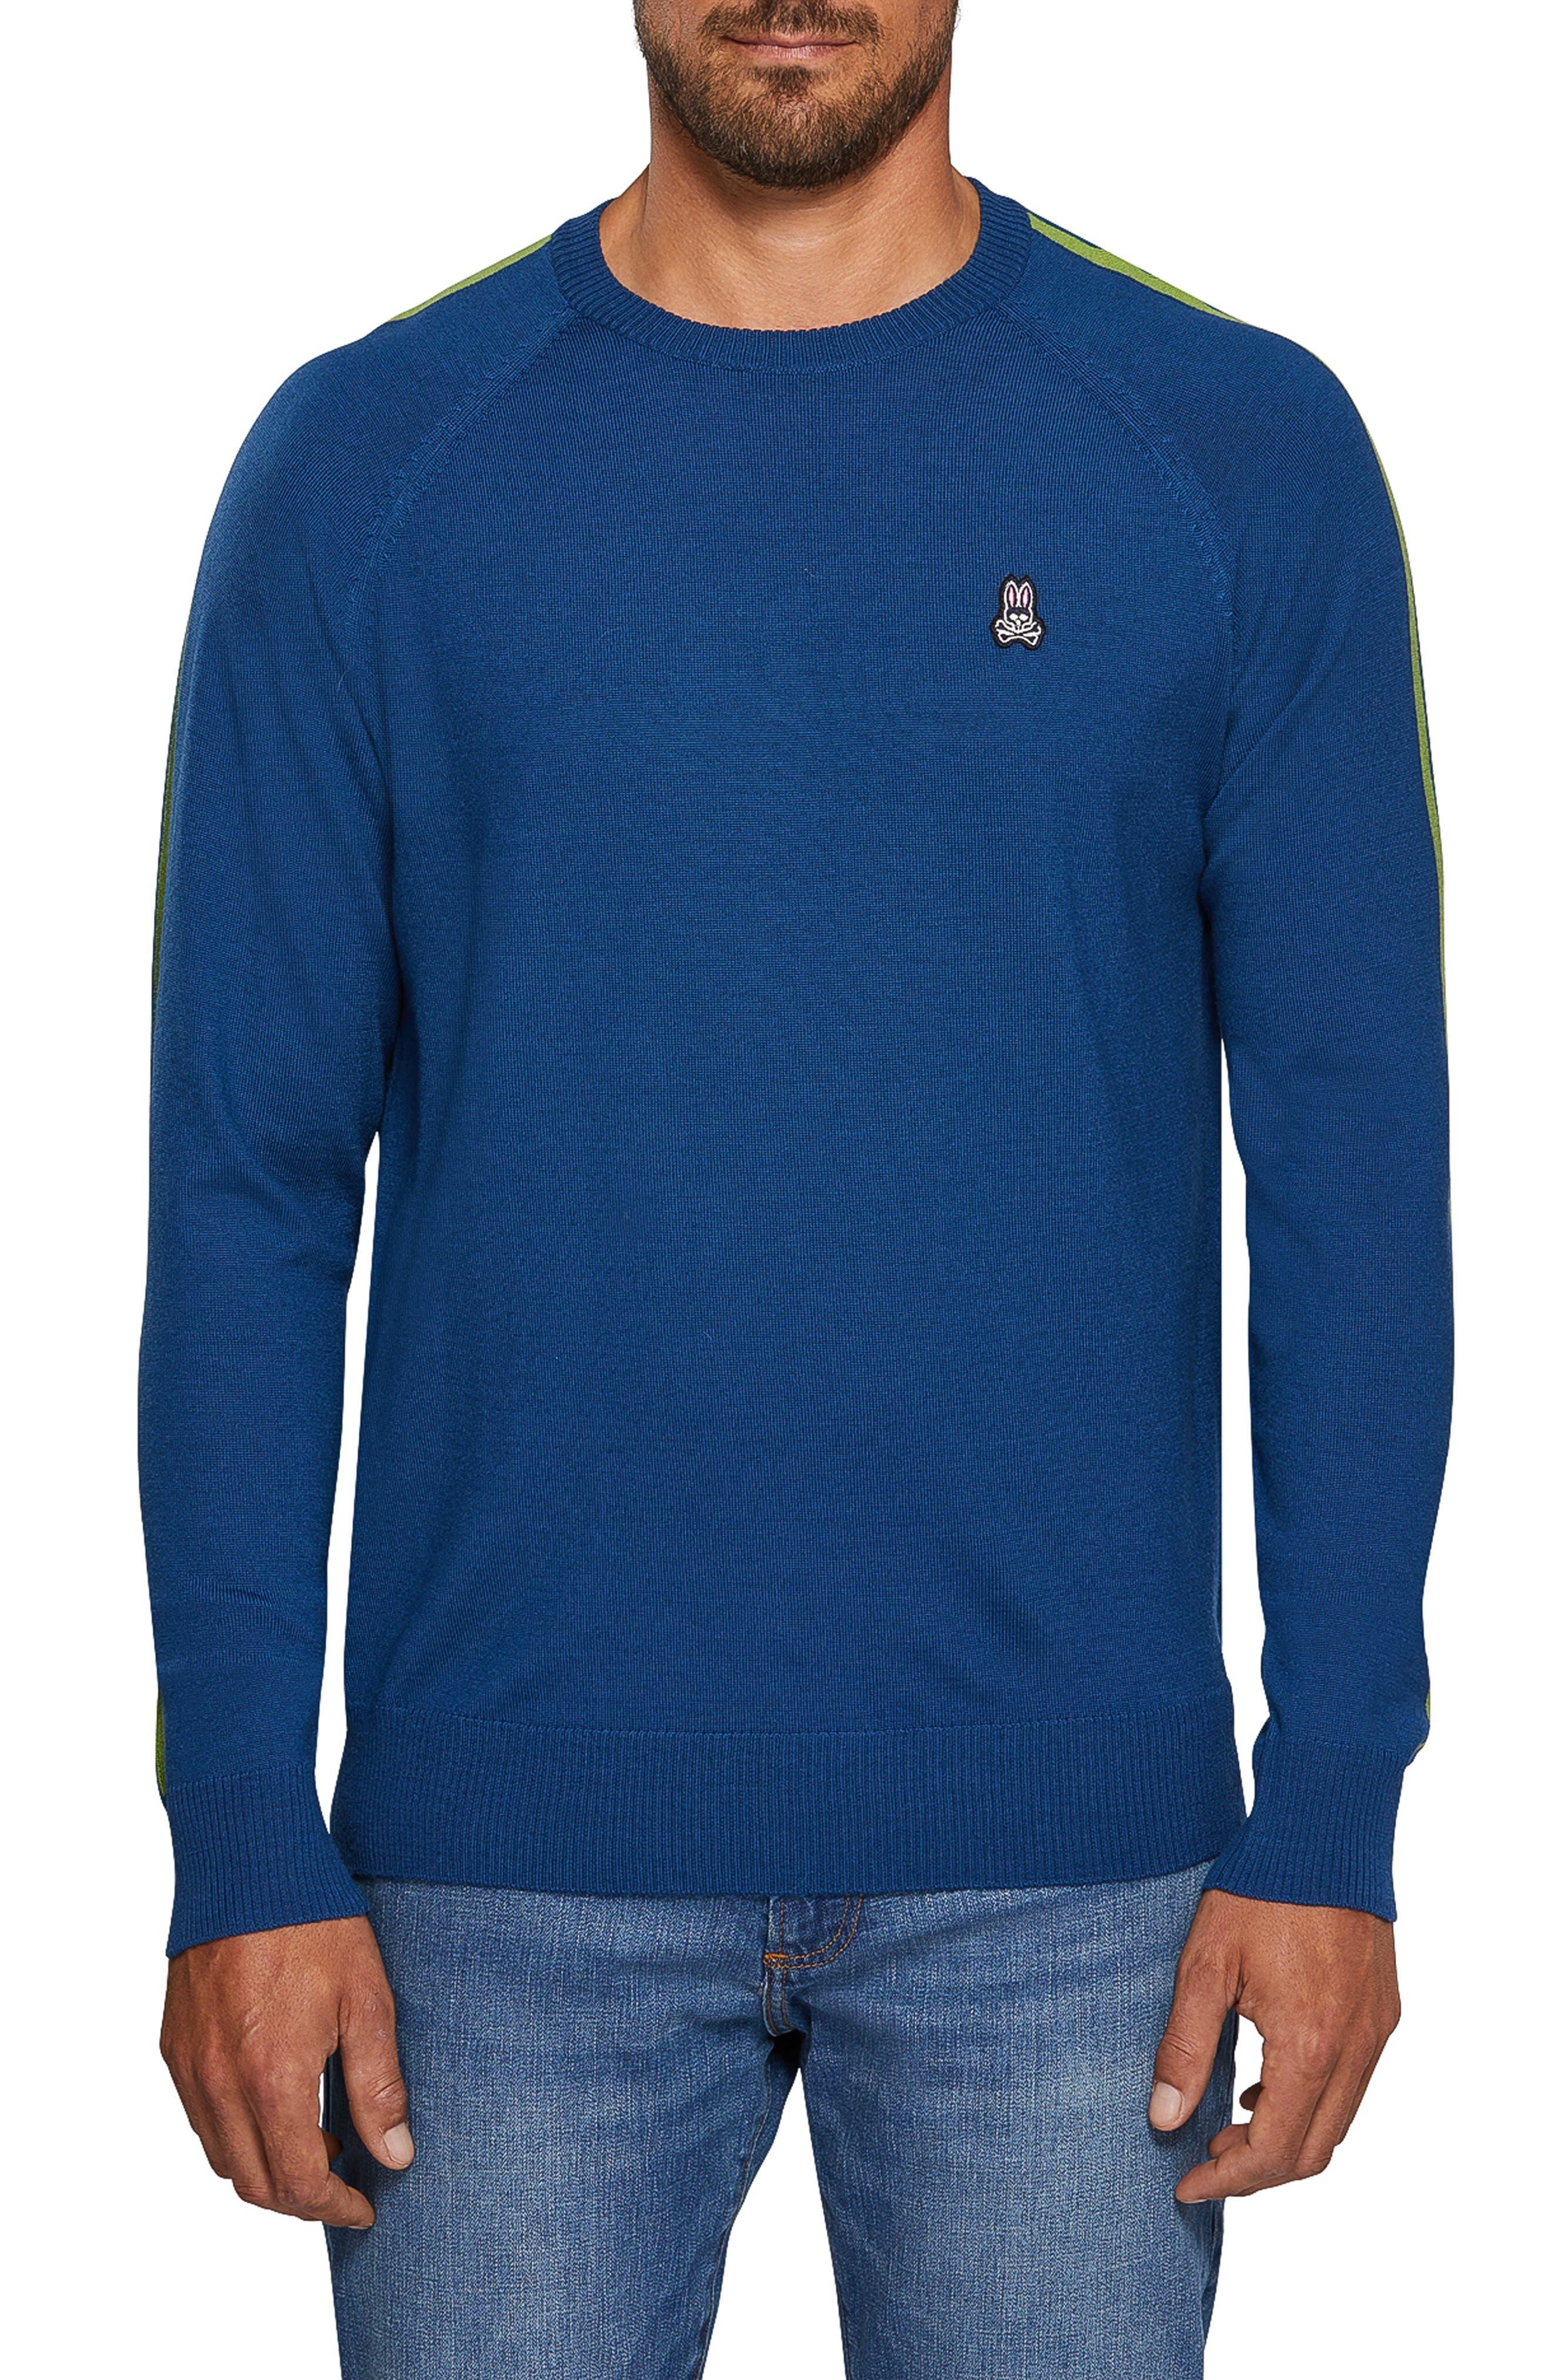 Psycho Bunny Raglan Merino Wool Sweater, Blue